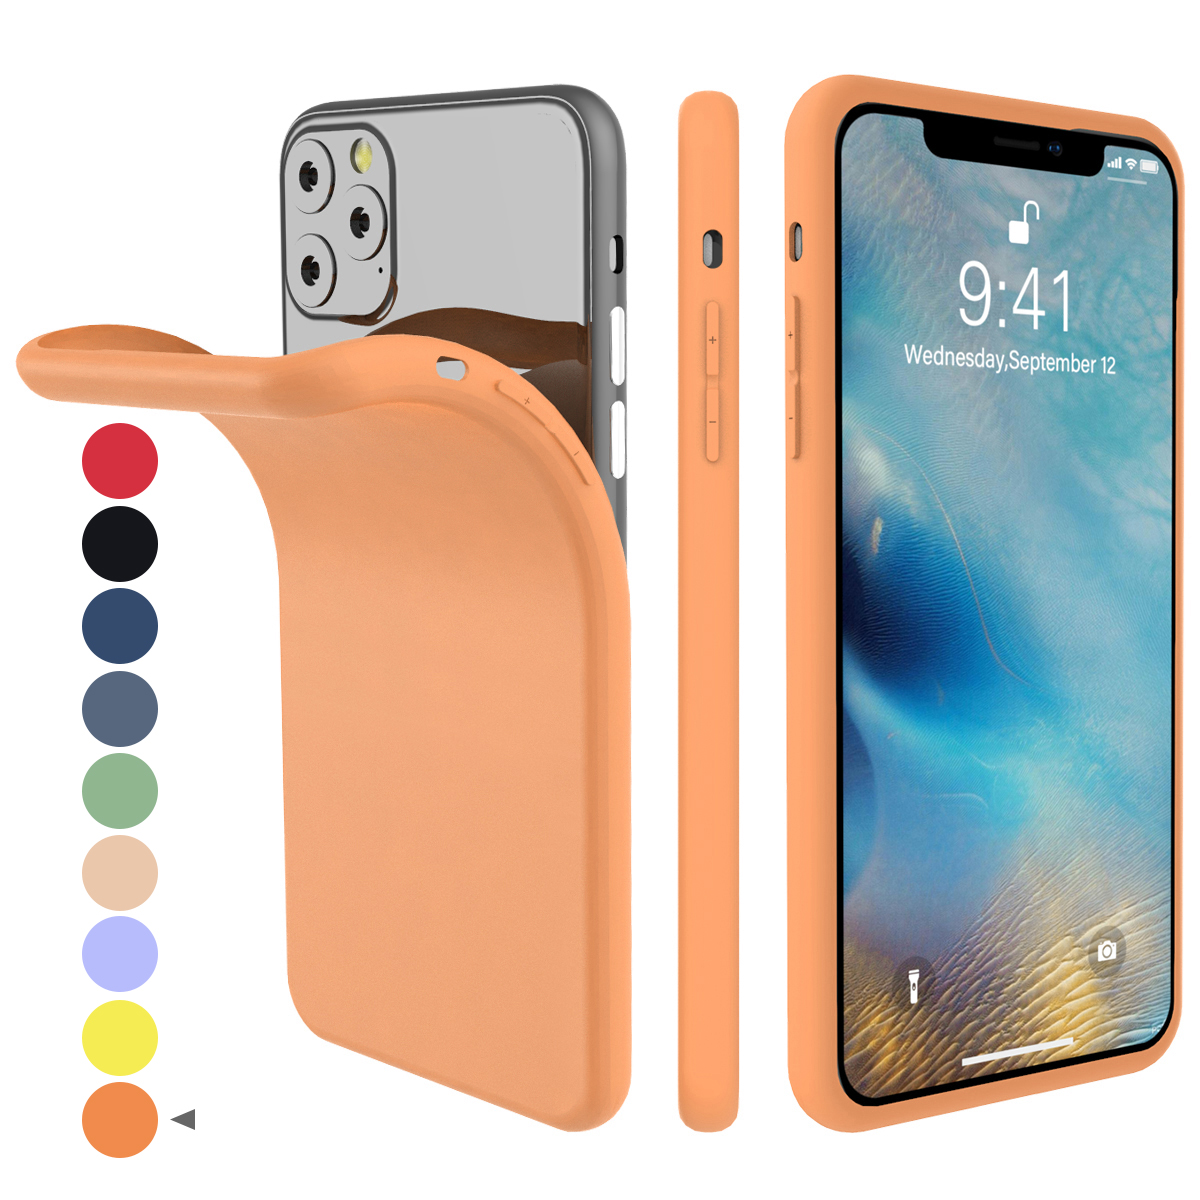 Torubia Silicone Case for iPhone 11/11 Pro/11 Pro Max 116